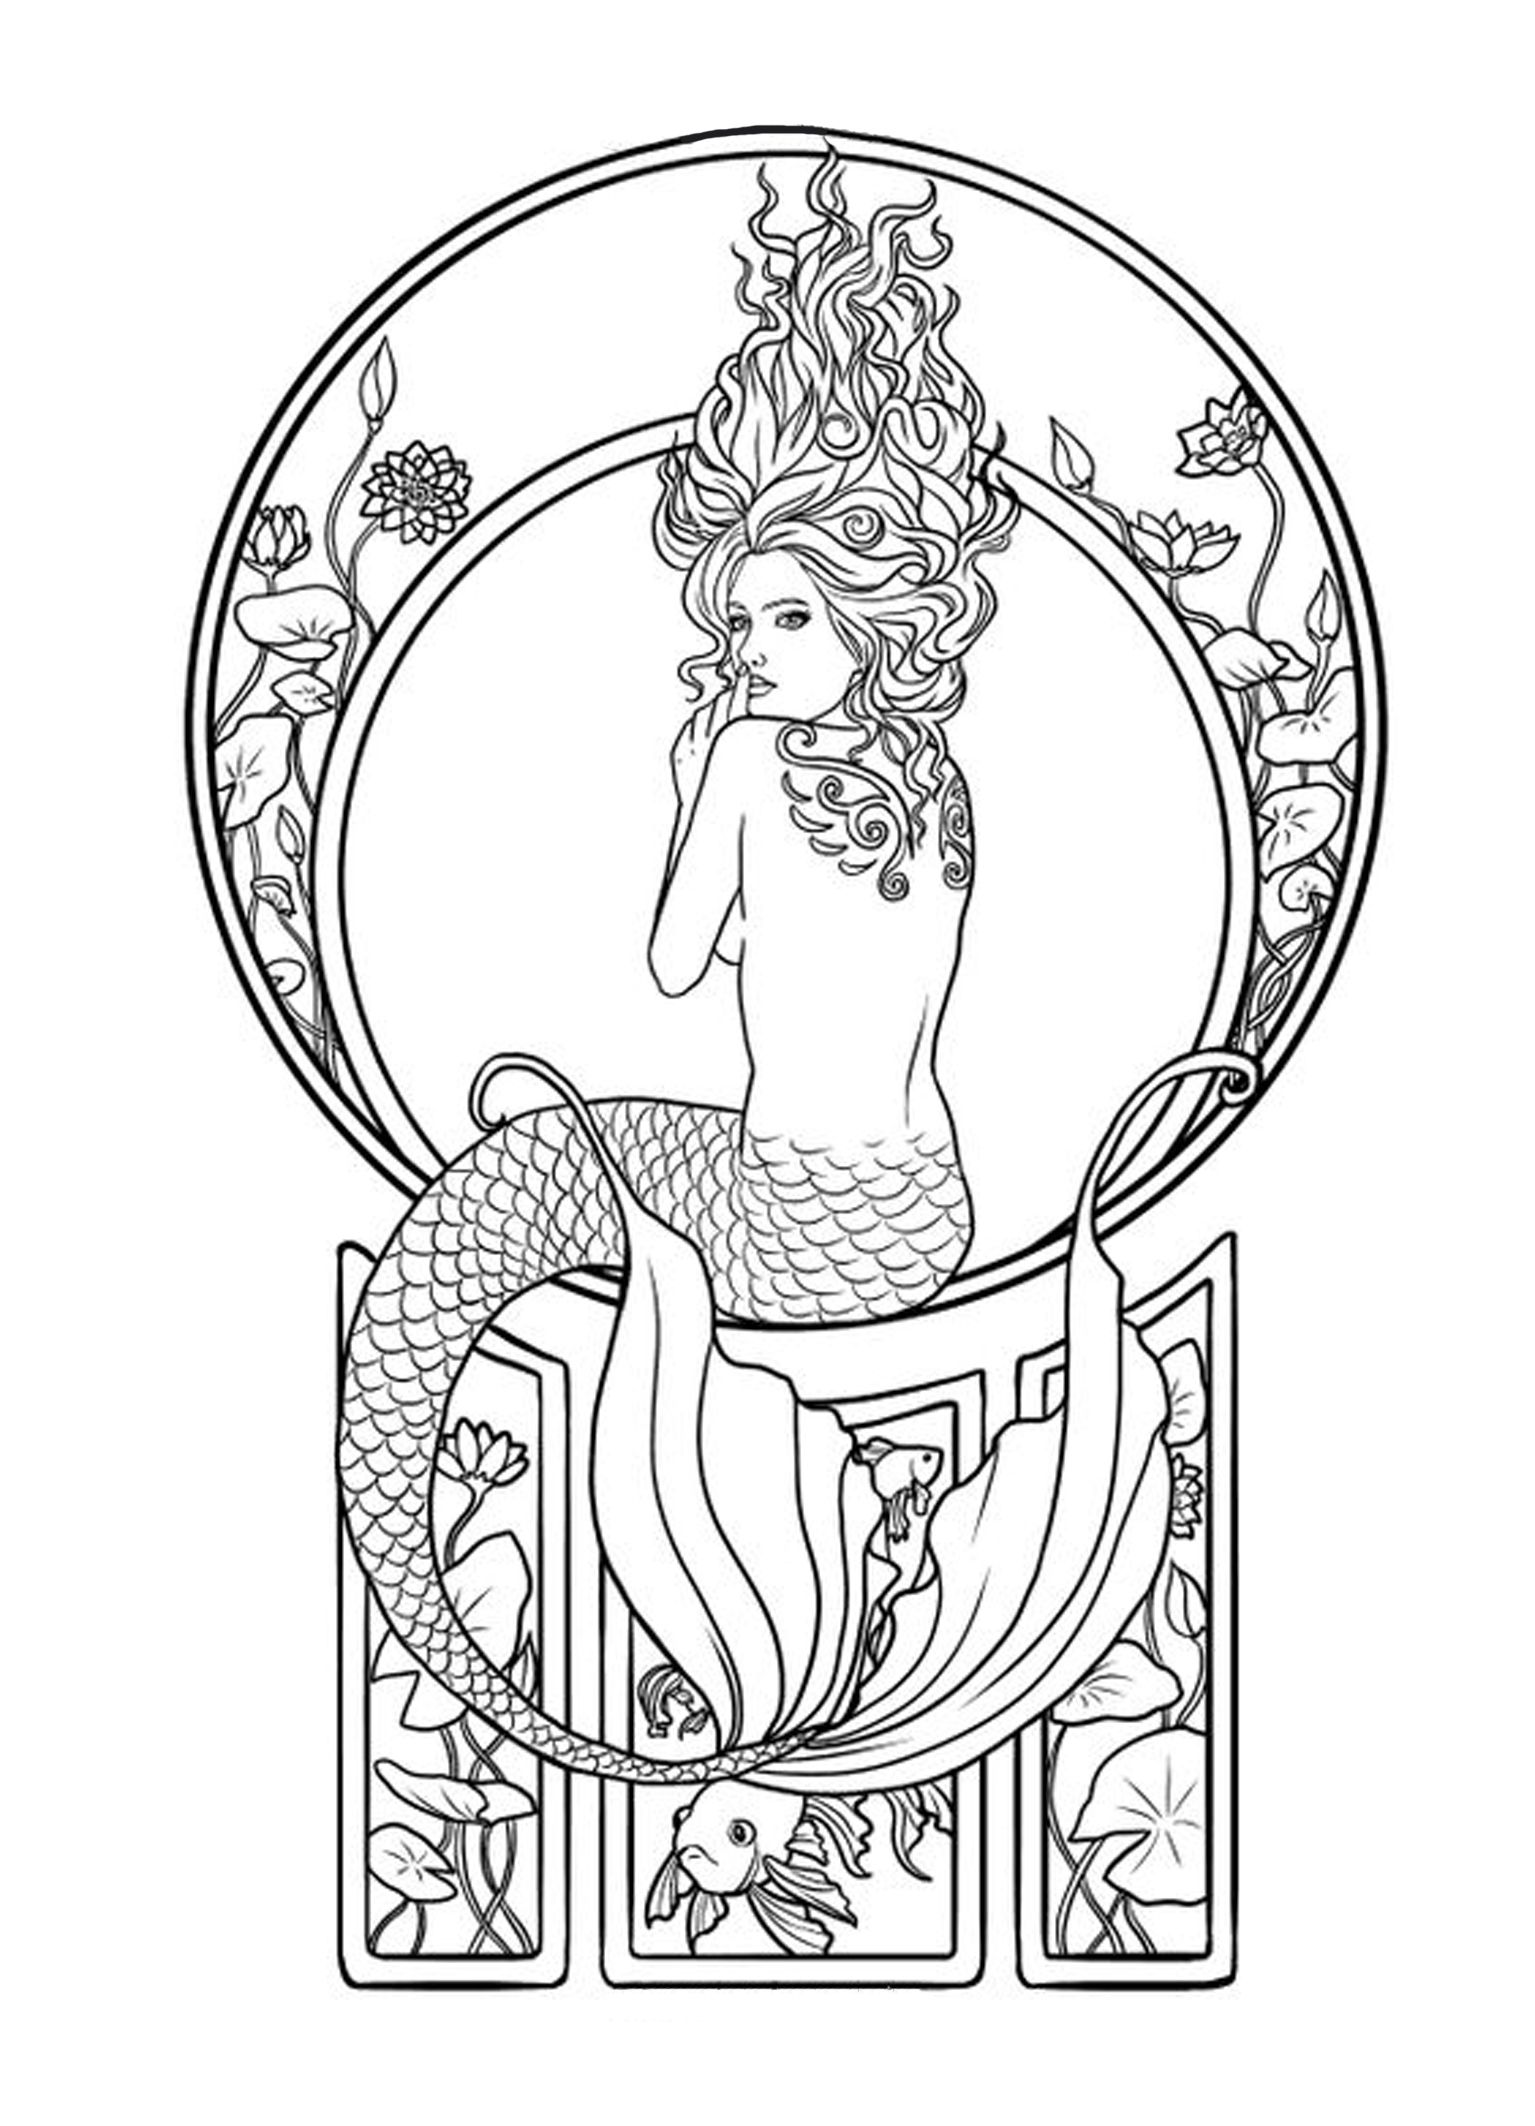 Tattoo Idea Mermaid Coloring Pages Mermaid Coloring Art Nouveau Tattoo